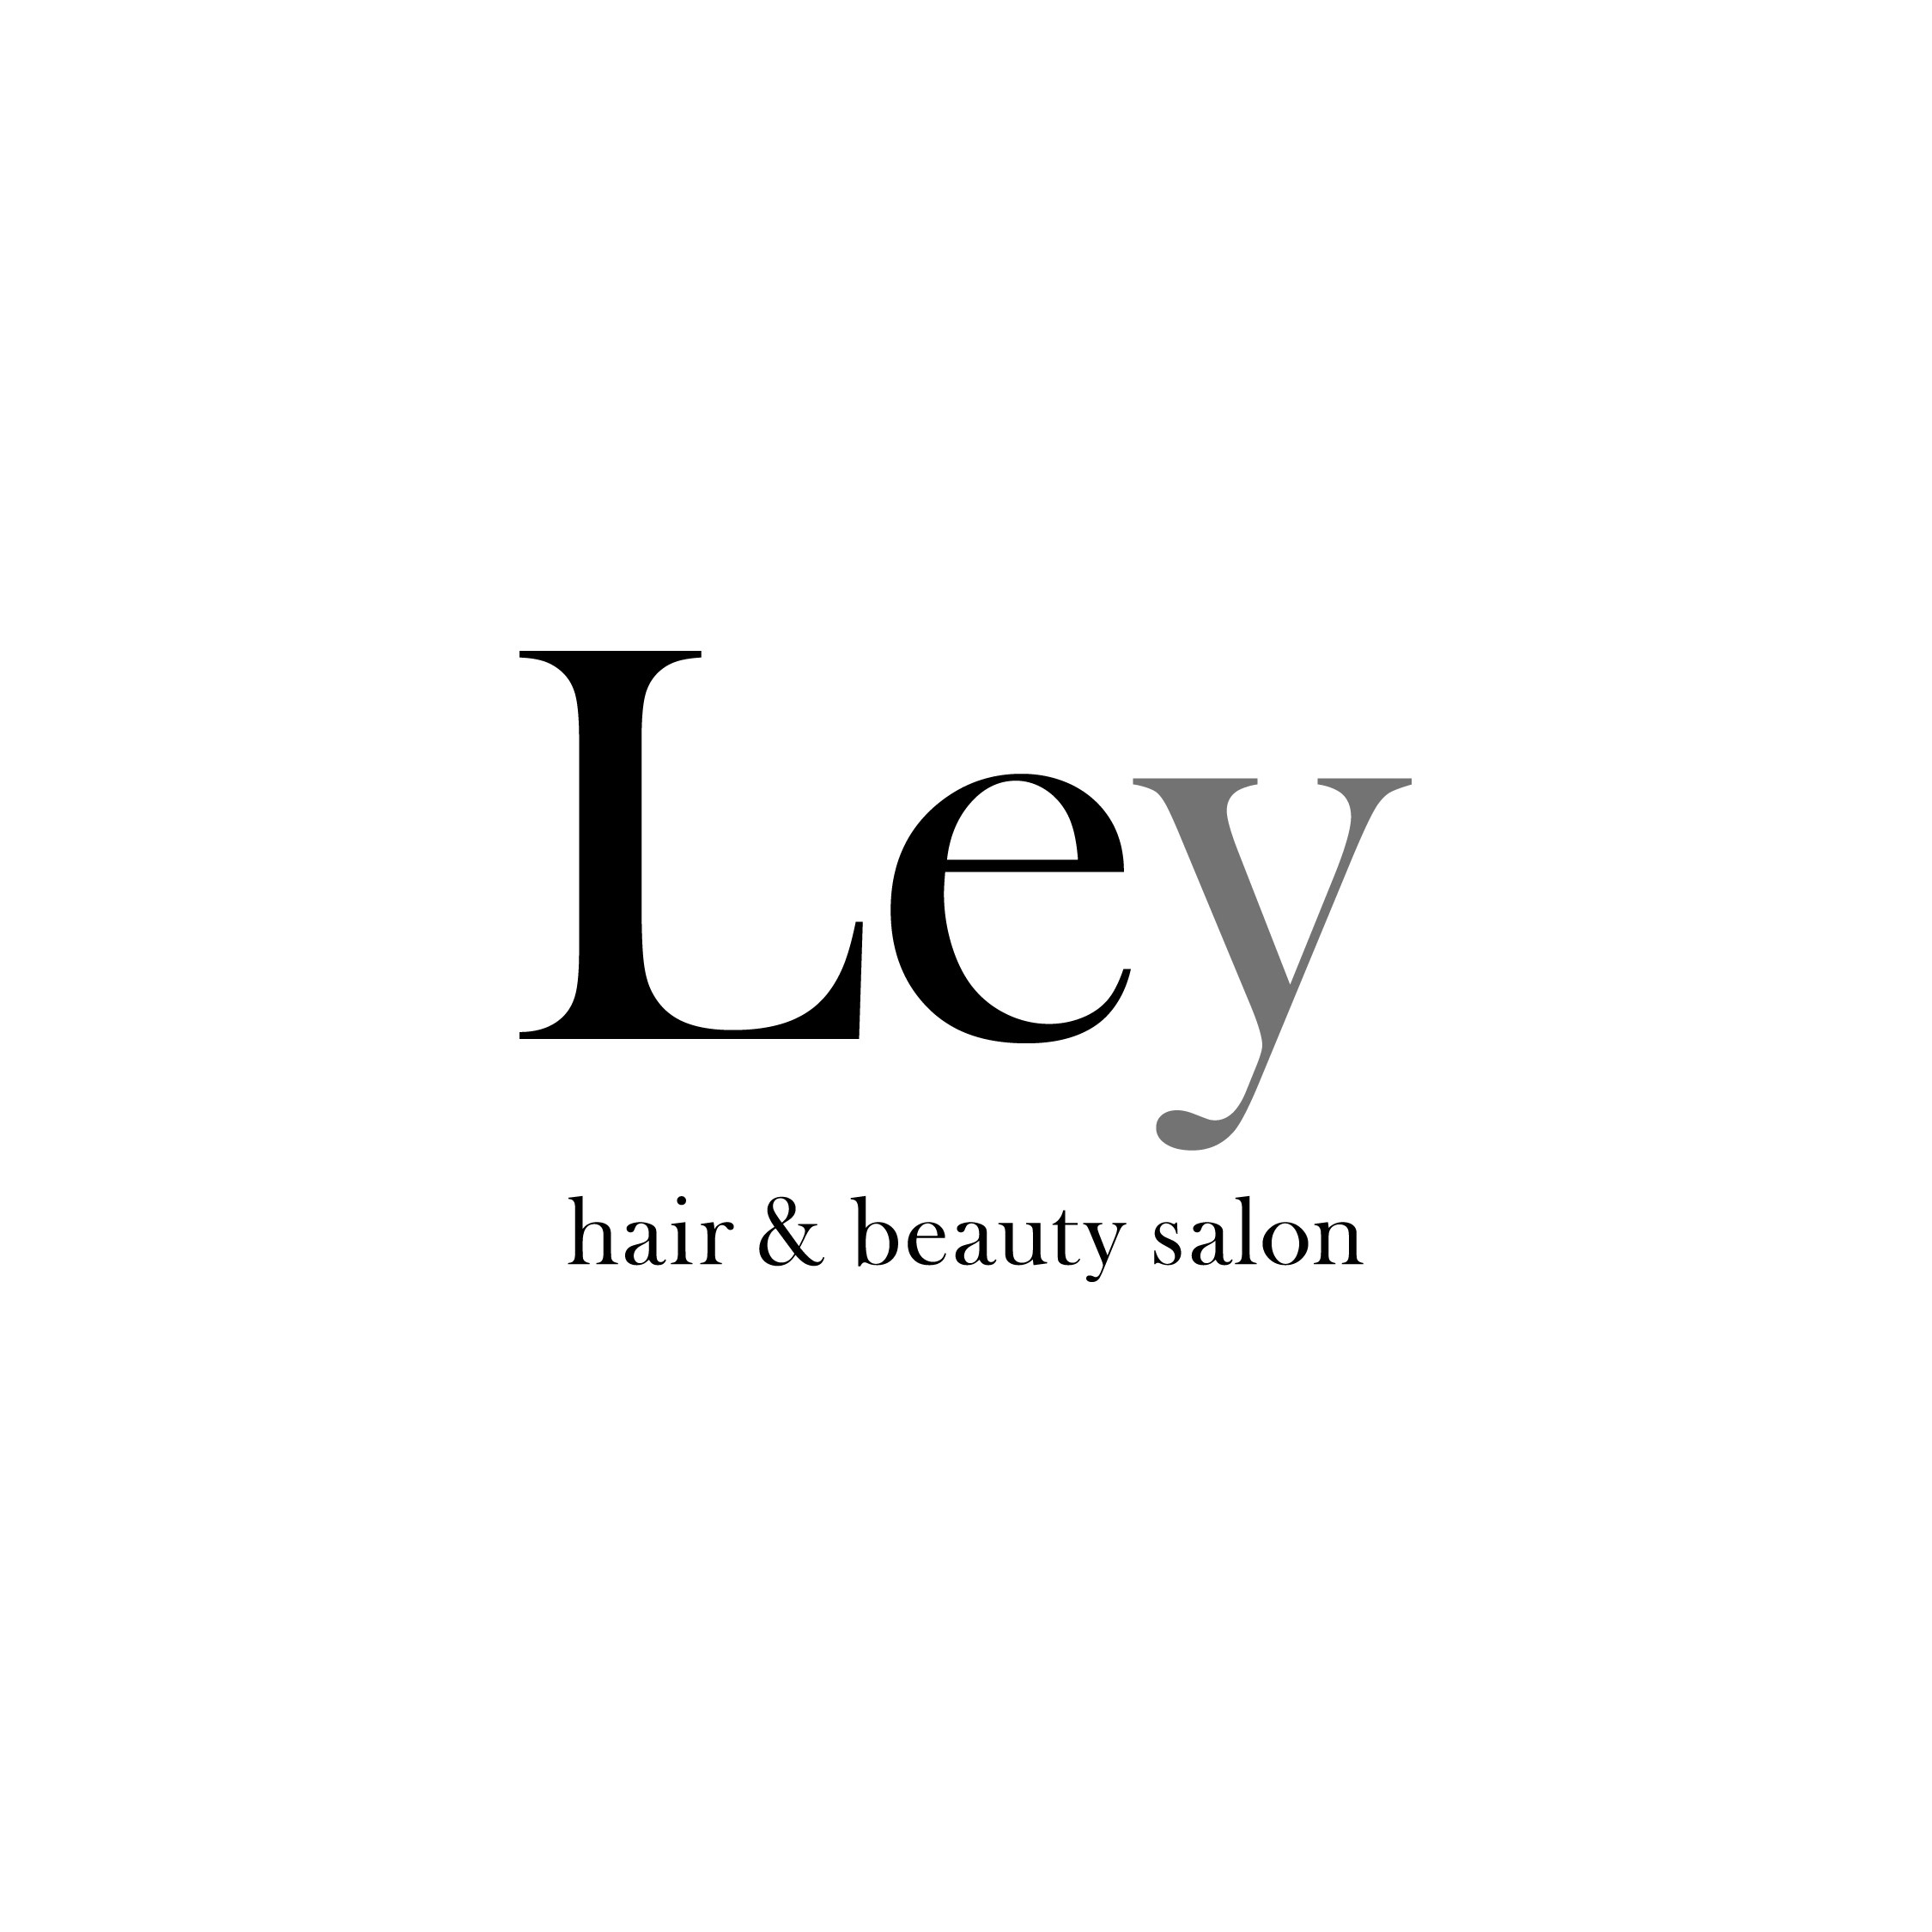 Hair and beauty salon Ley|CIロゴデザイン グラフィックデザイン ブランドデザイン|美容室|神奈川県横浜市